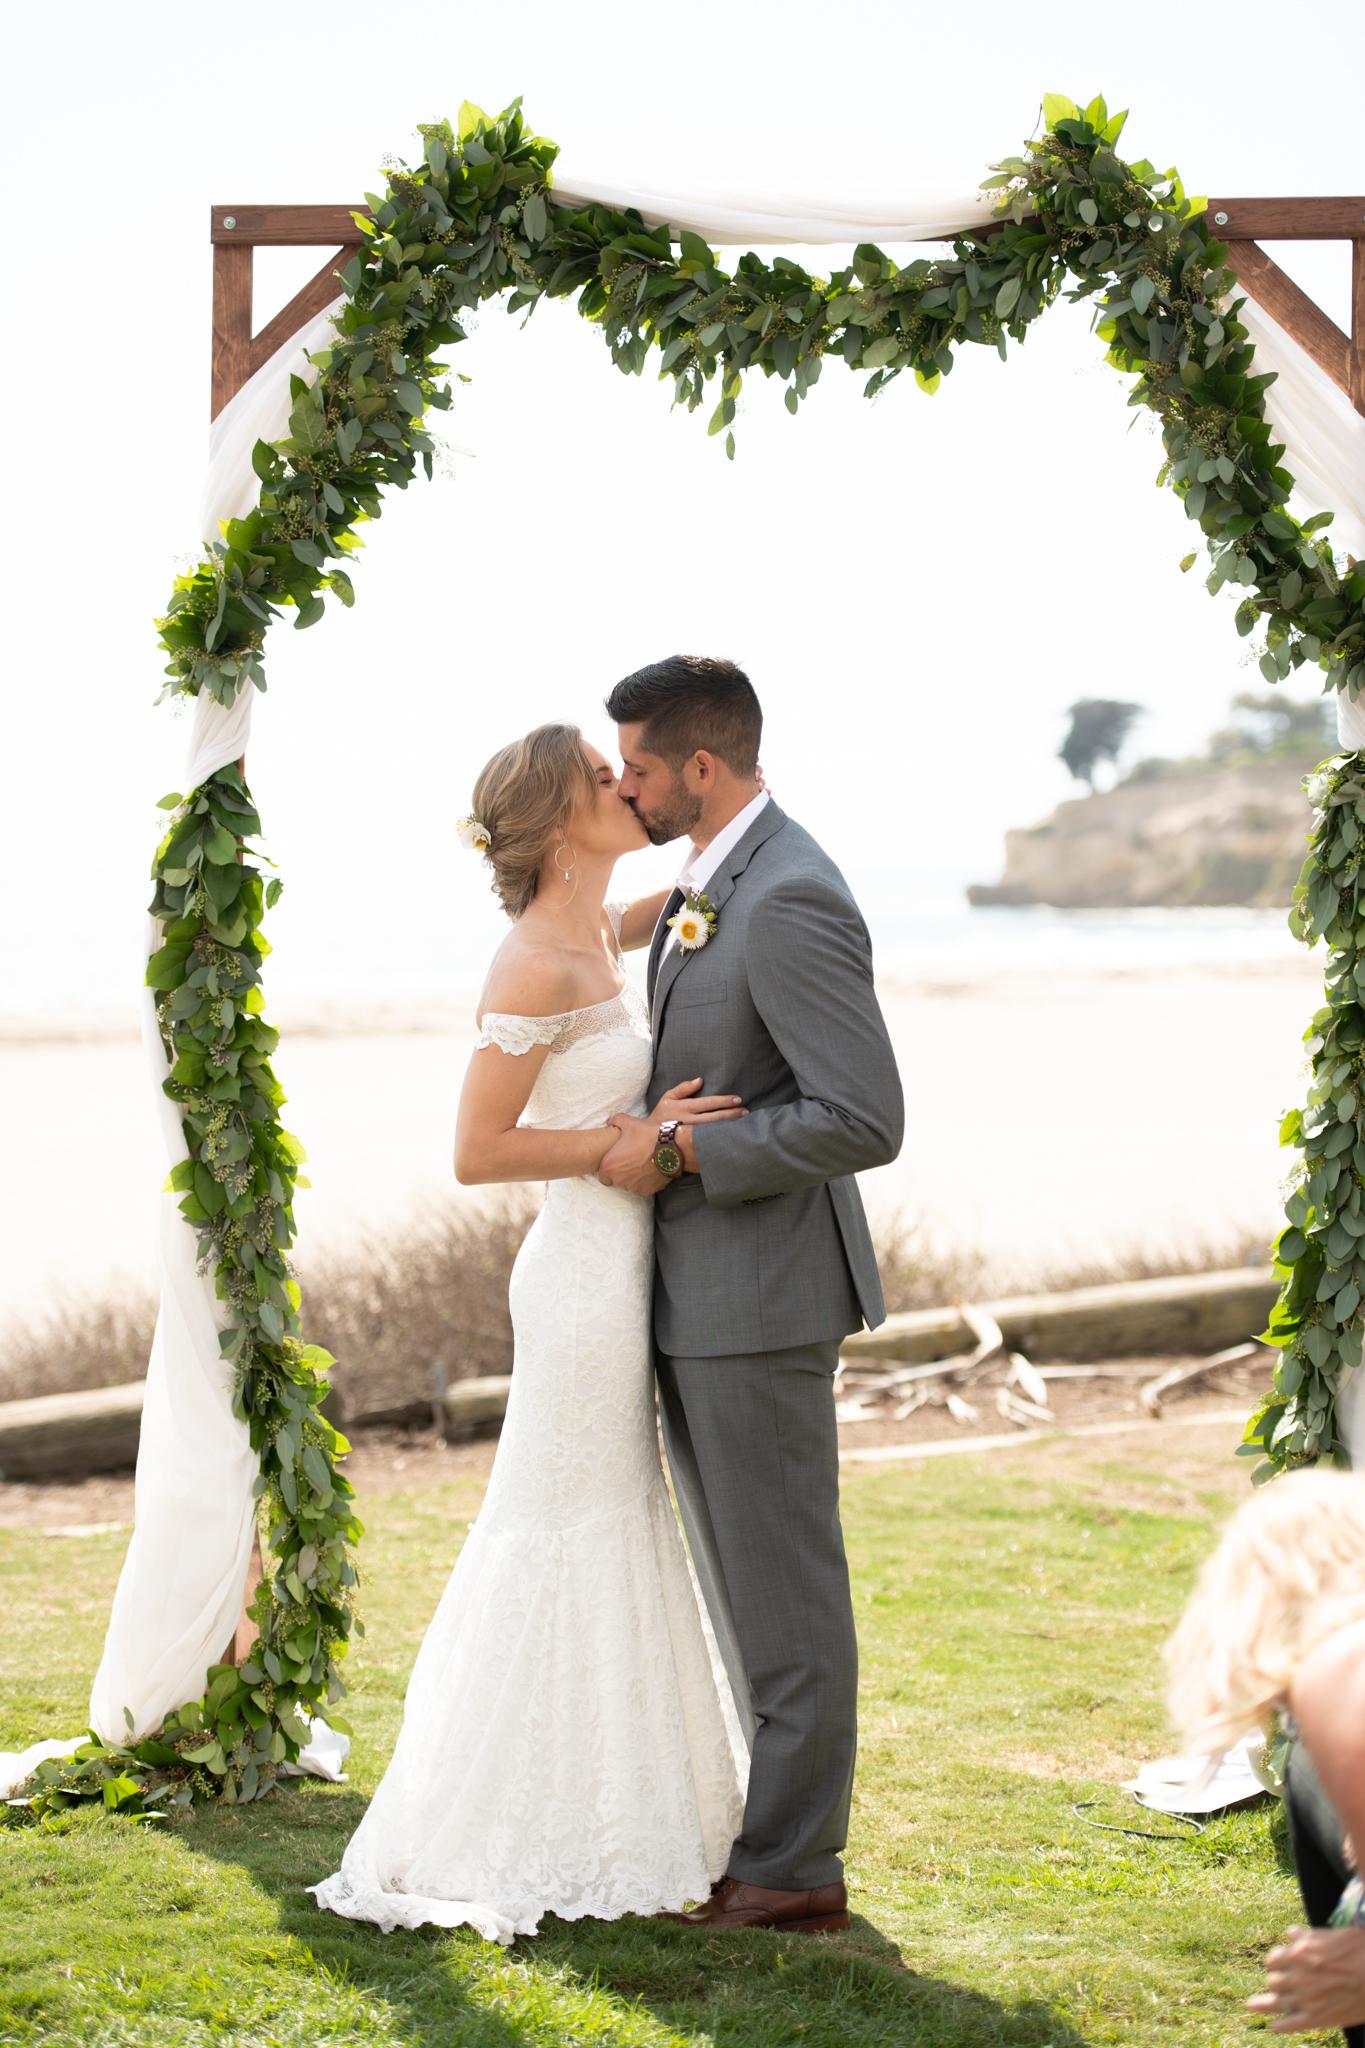 35_PRVW_Jenny_Ken_Wedding_Trevor_Hooper_Photo.jpg